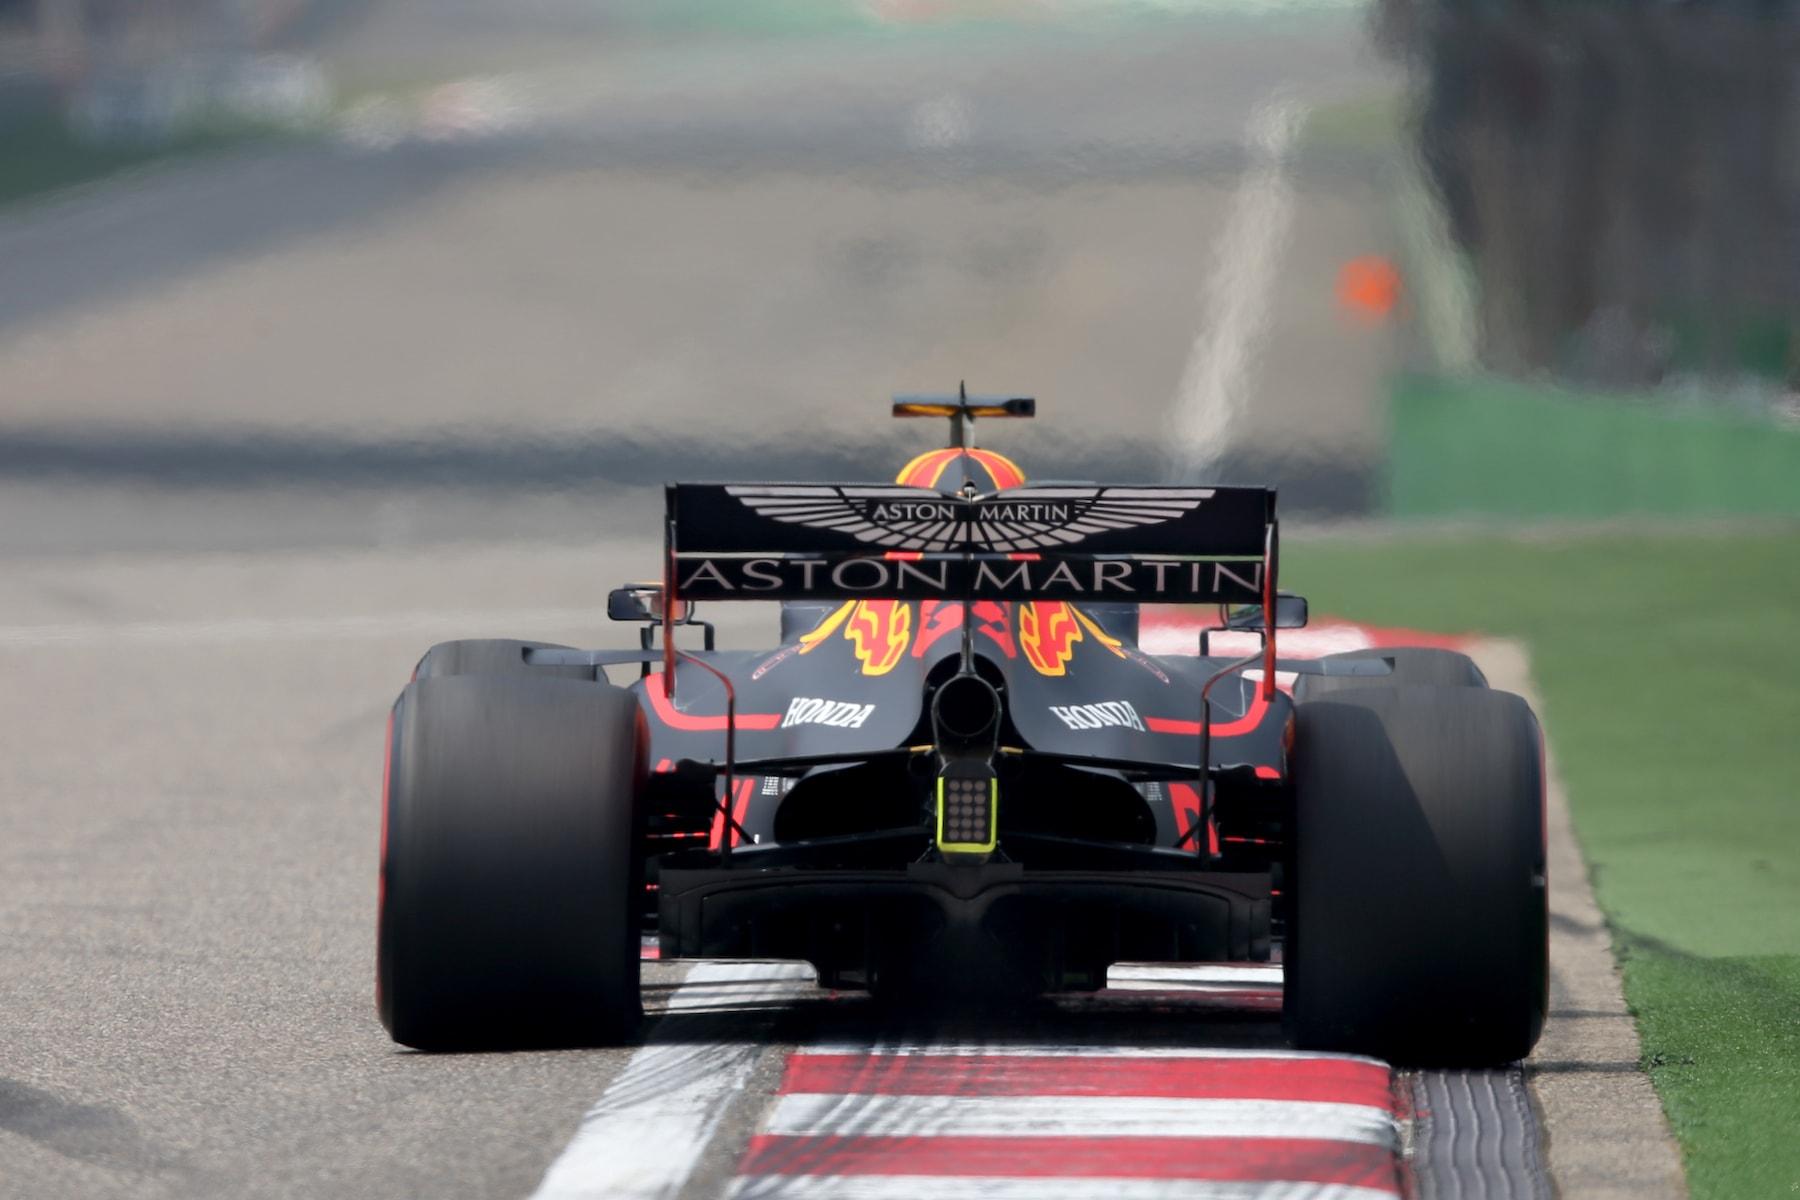 1 2019 Max Verstappen | Red Bull RB15 | 2019 Chinese GP FP1 3 copy.jpg